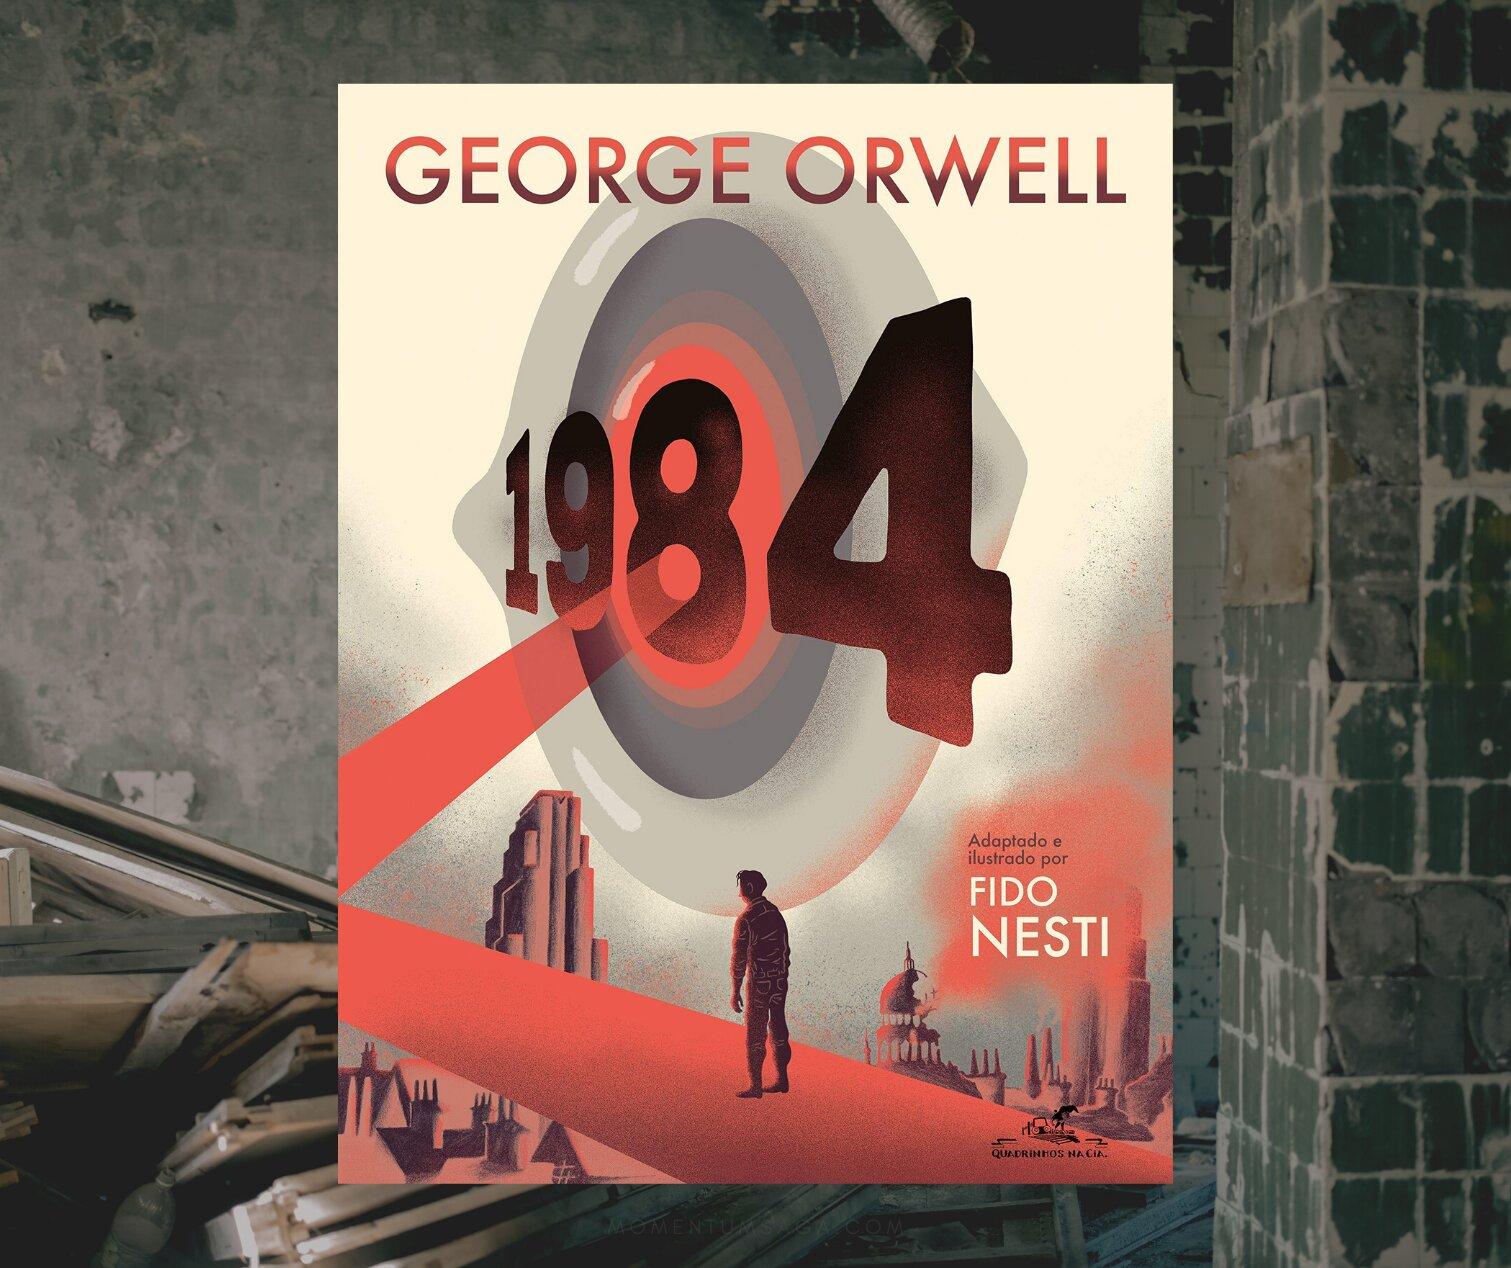 Resenha: 1984, de George Orwell e Fido Nesti